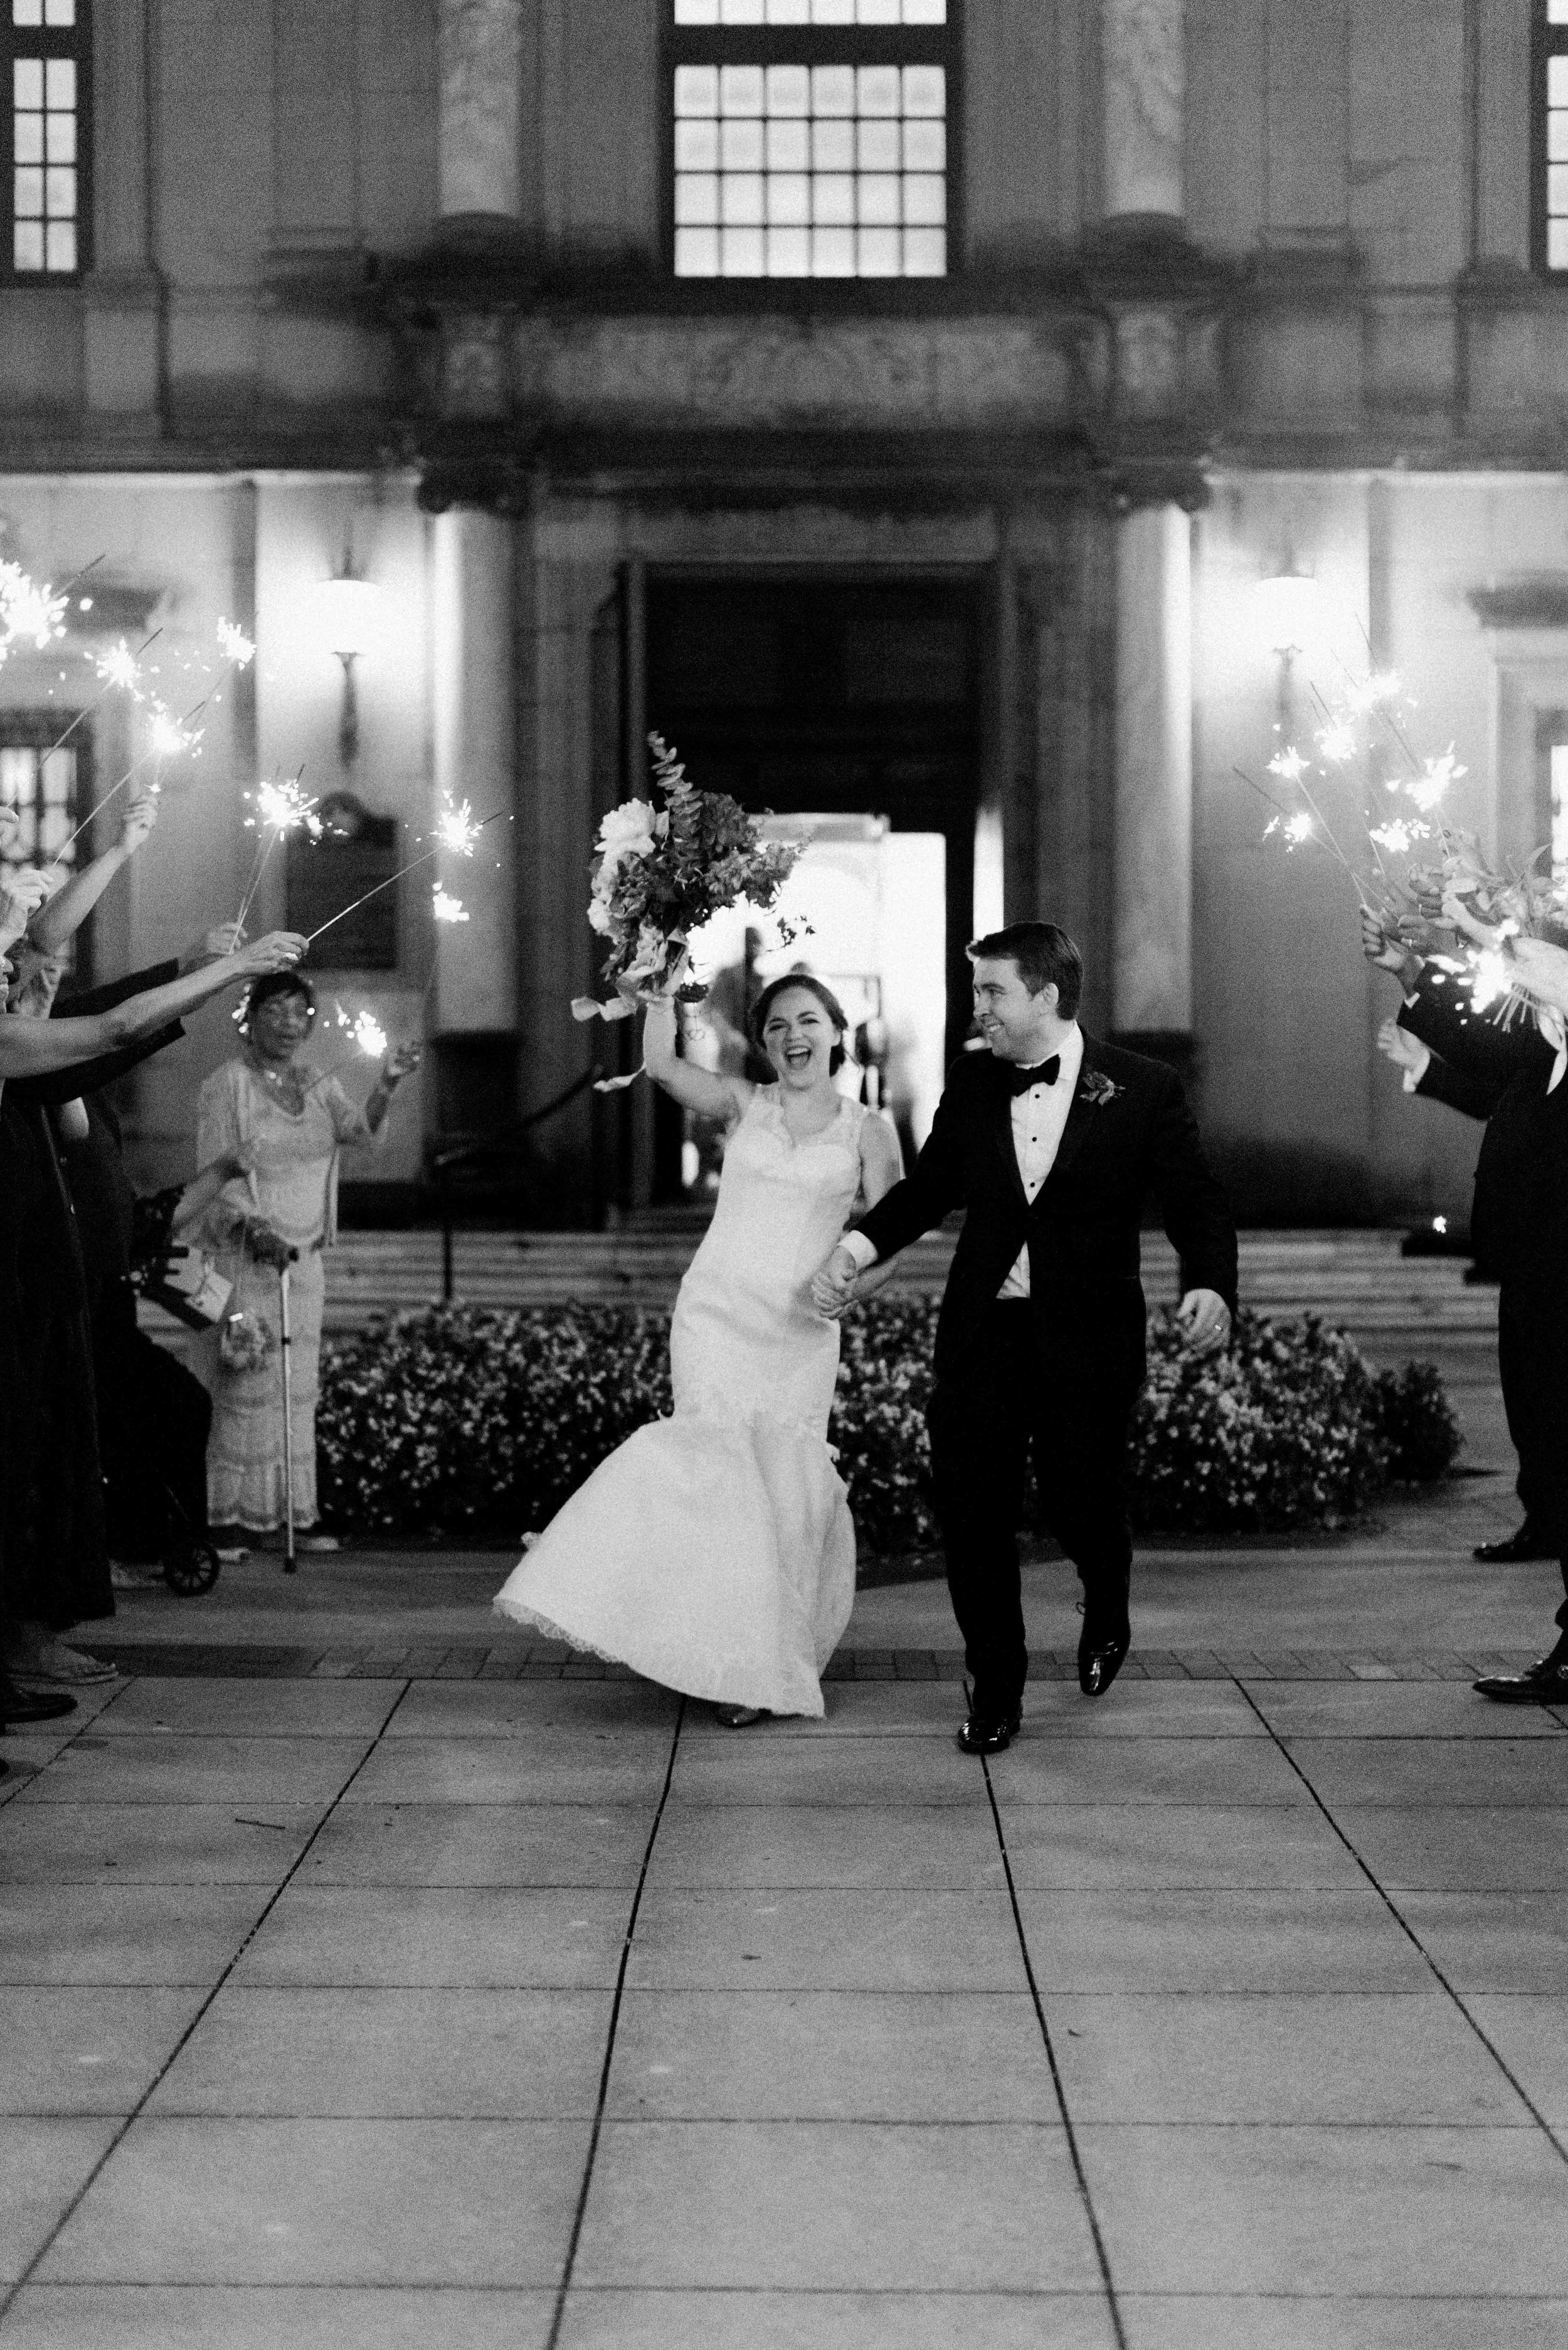 The-Knot-Texas-Fine-Art-Wedding-Film-Destination-Photographer-Houston-Austin-Dallas-New-Orleans-Julia-Ideson-Library-Event-Dana-Josh-Fernandez-Photograph-Top-Best-88.jpg